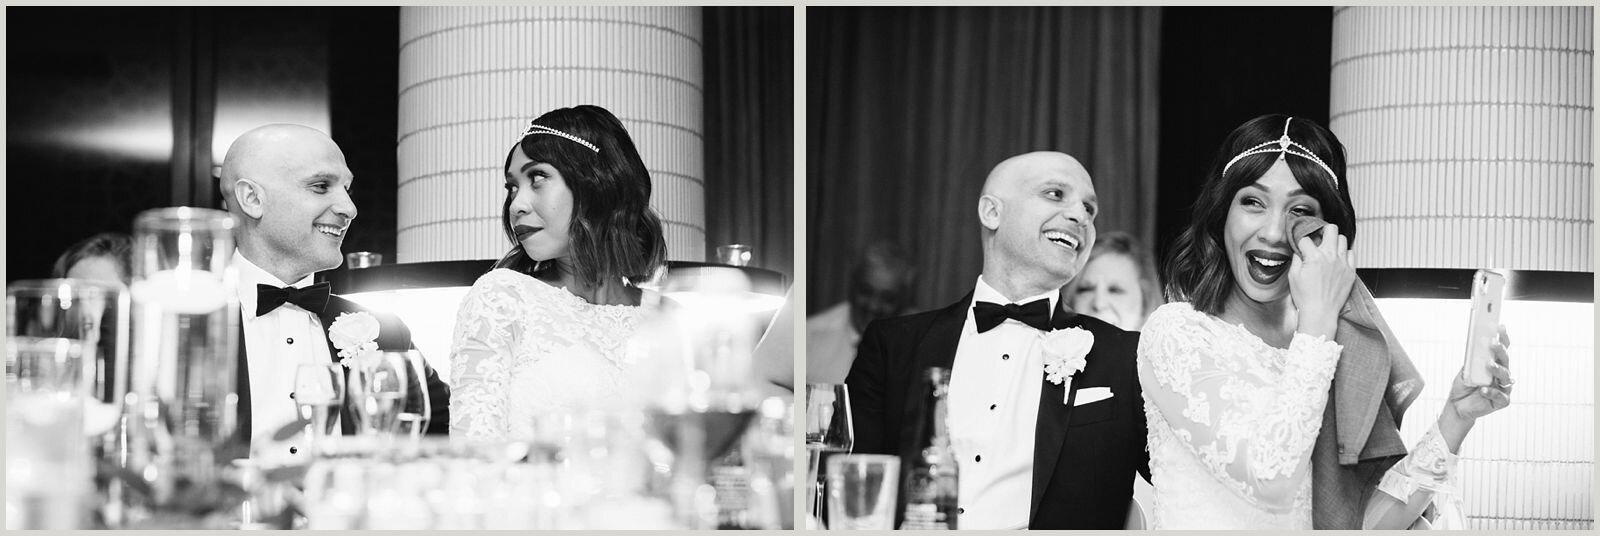 joseph_koprek_wedding_melbourne_the_prince_deck_0090.jpg